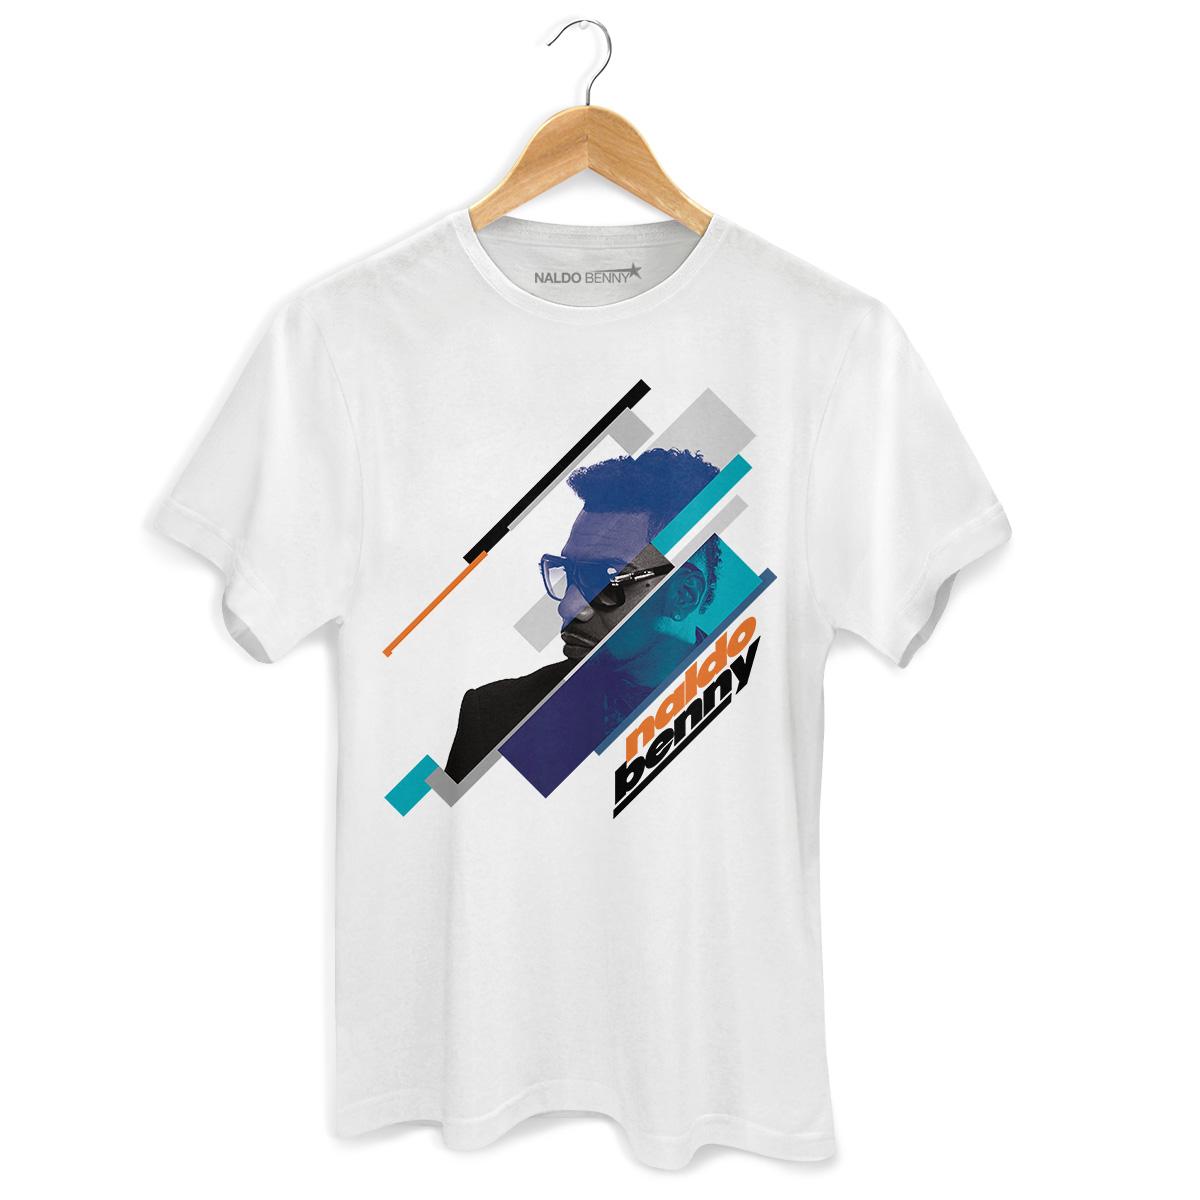 Camiseta Masculina Naldo Benny Perfil